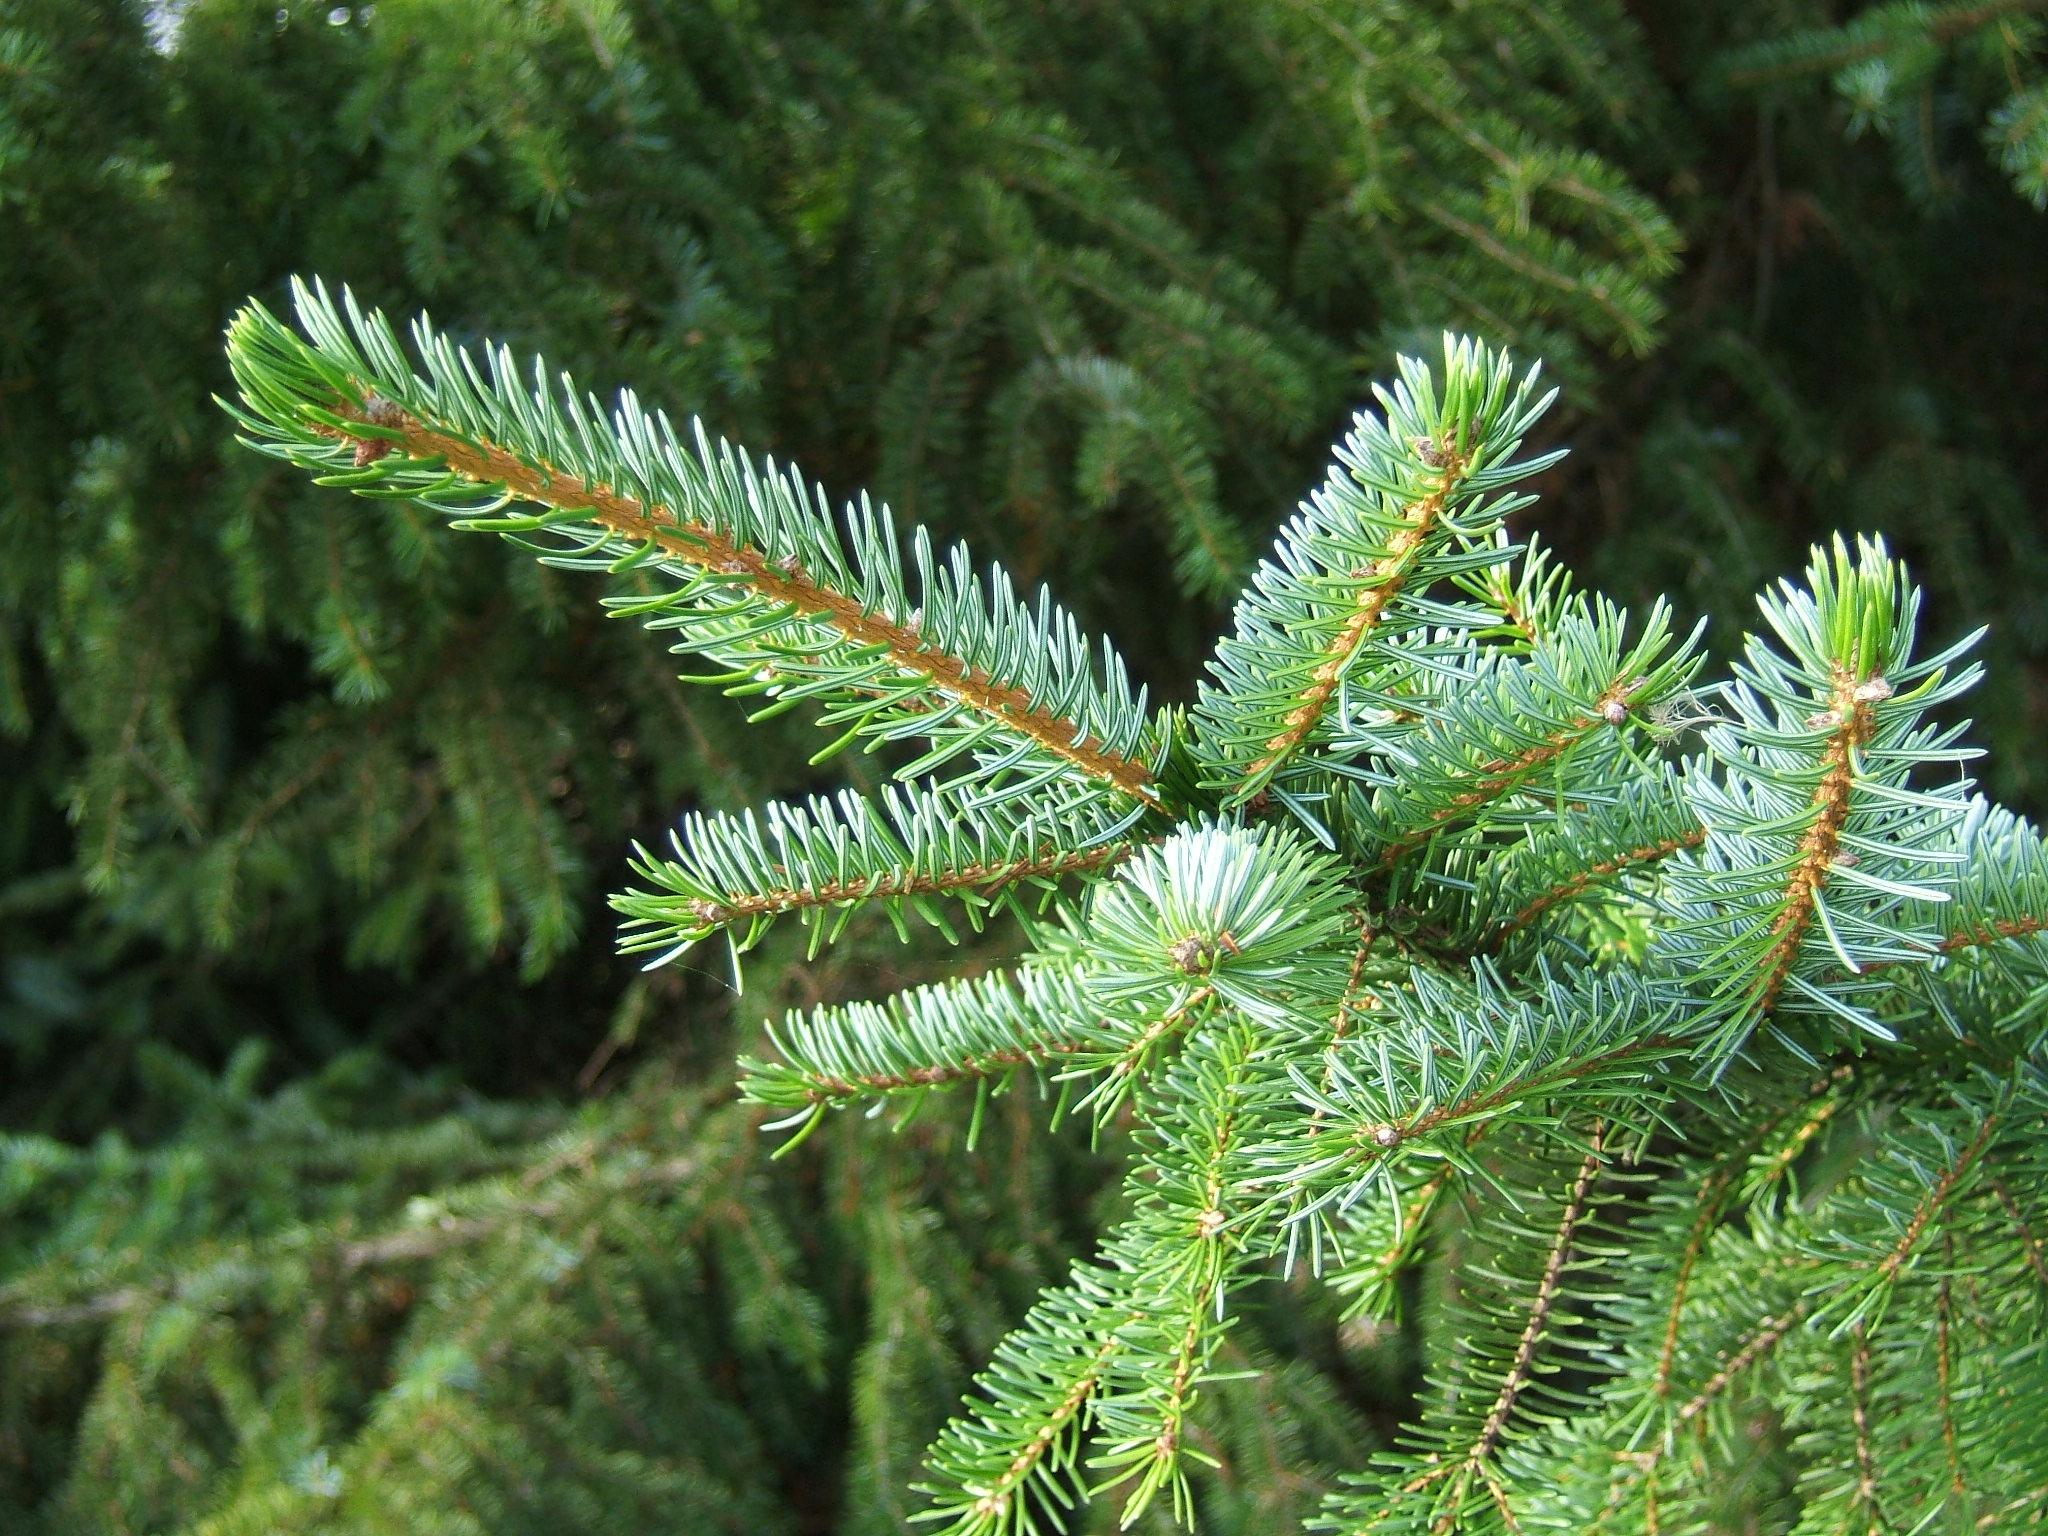 Picea-omorika-1